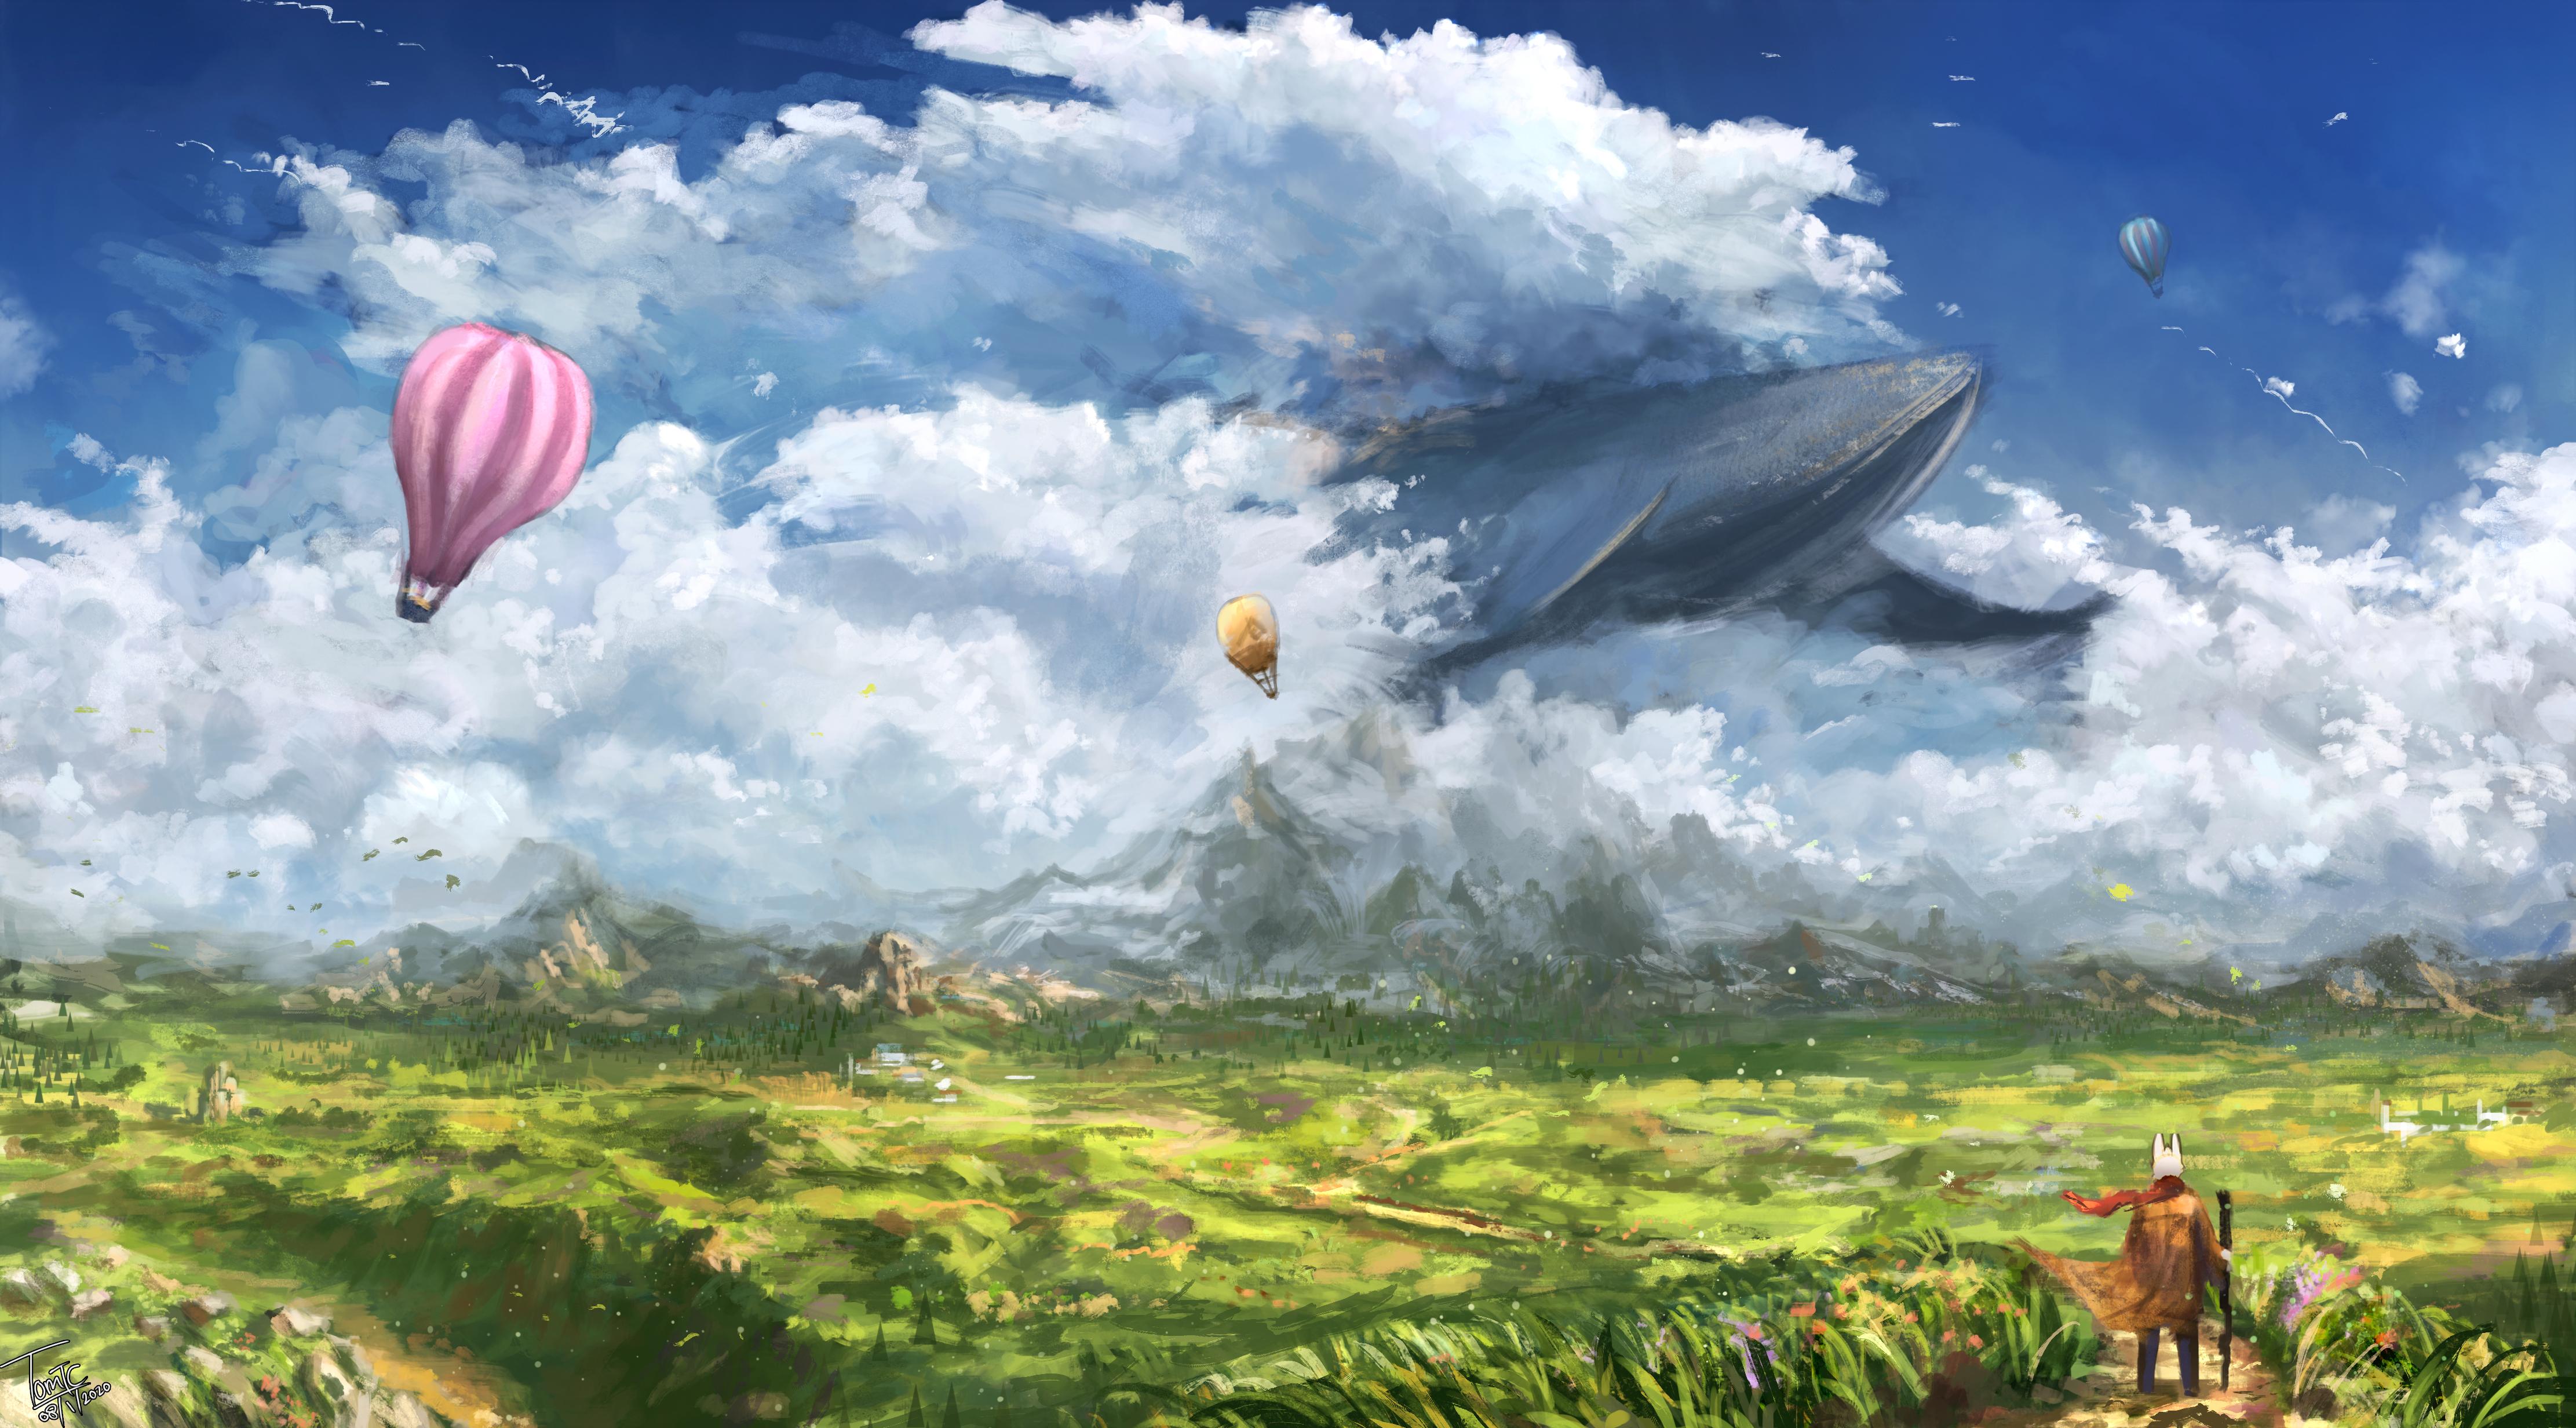 General 4446x2464 TomTC clouds whale grass mountains rabbits hot air balloons fantasy art field artwork